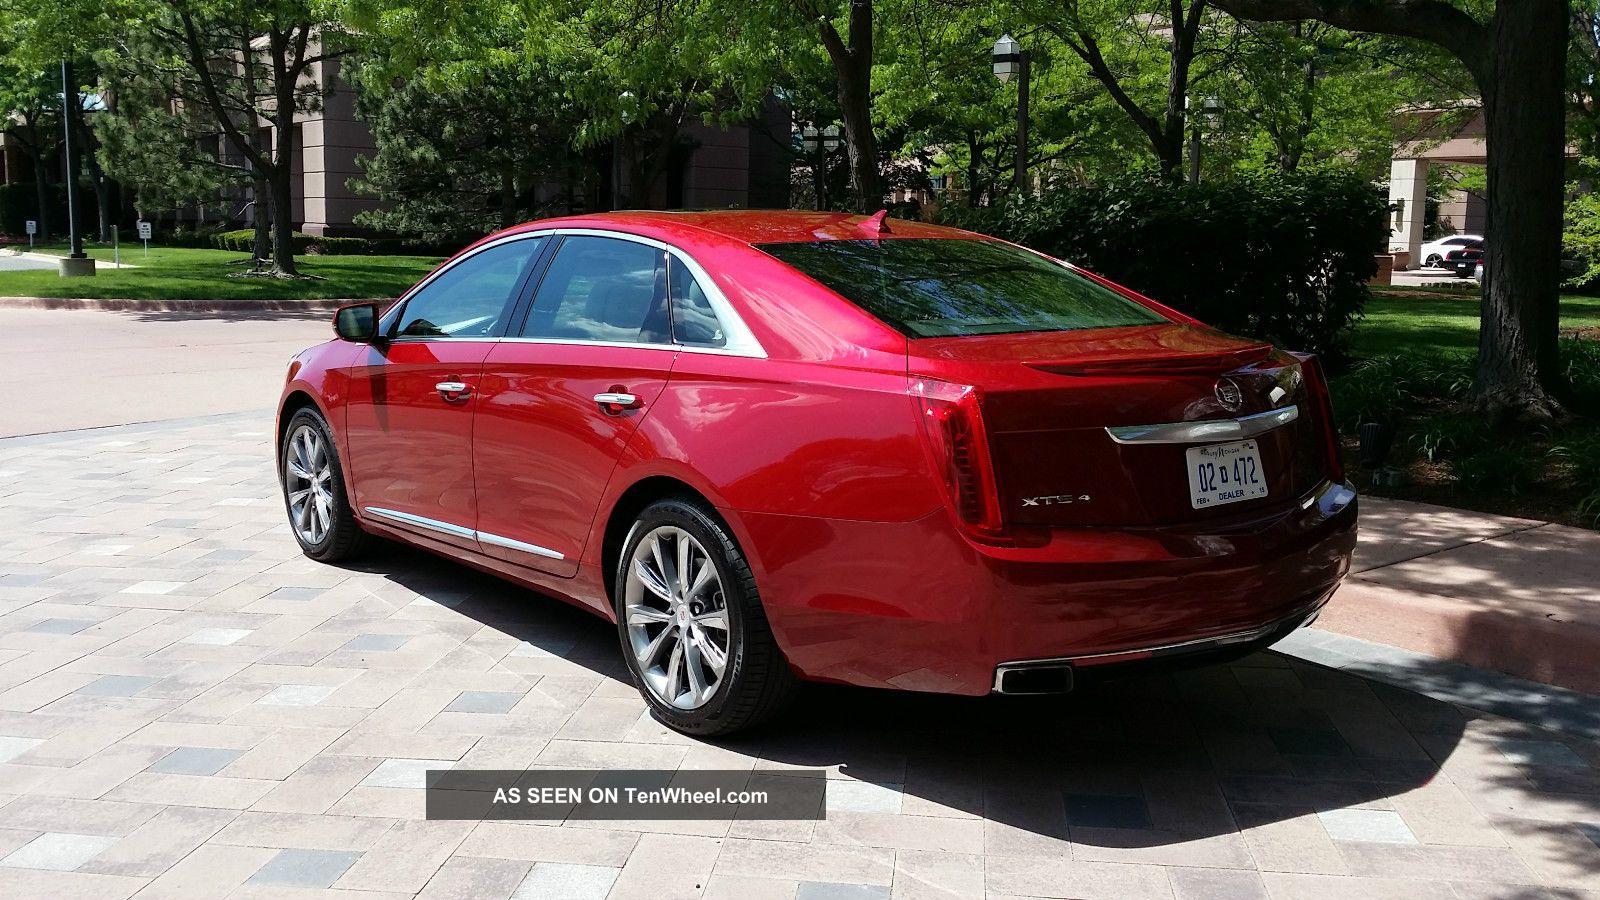 2013 Cadillac Xts Luxury Sedan 4 Door 3 6l